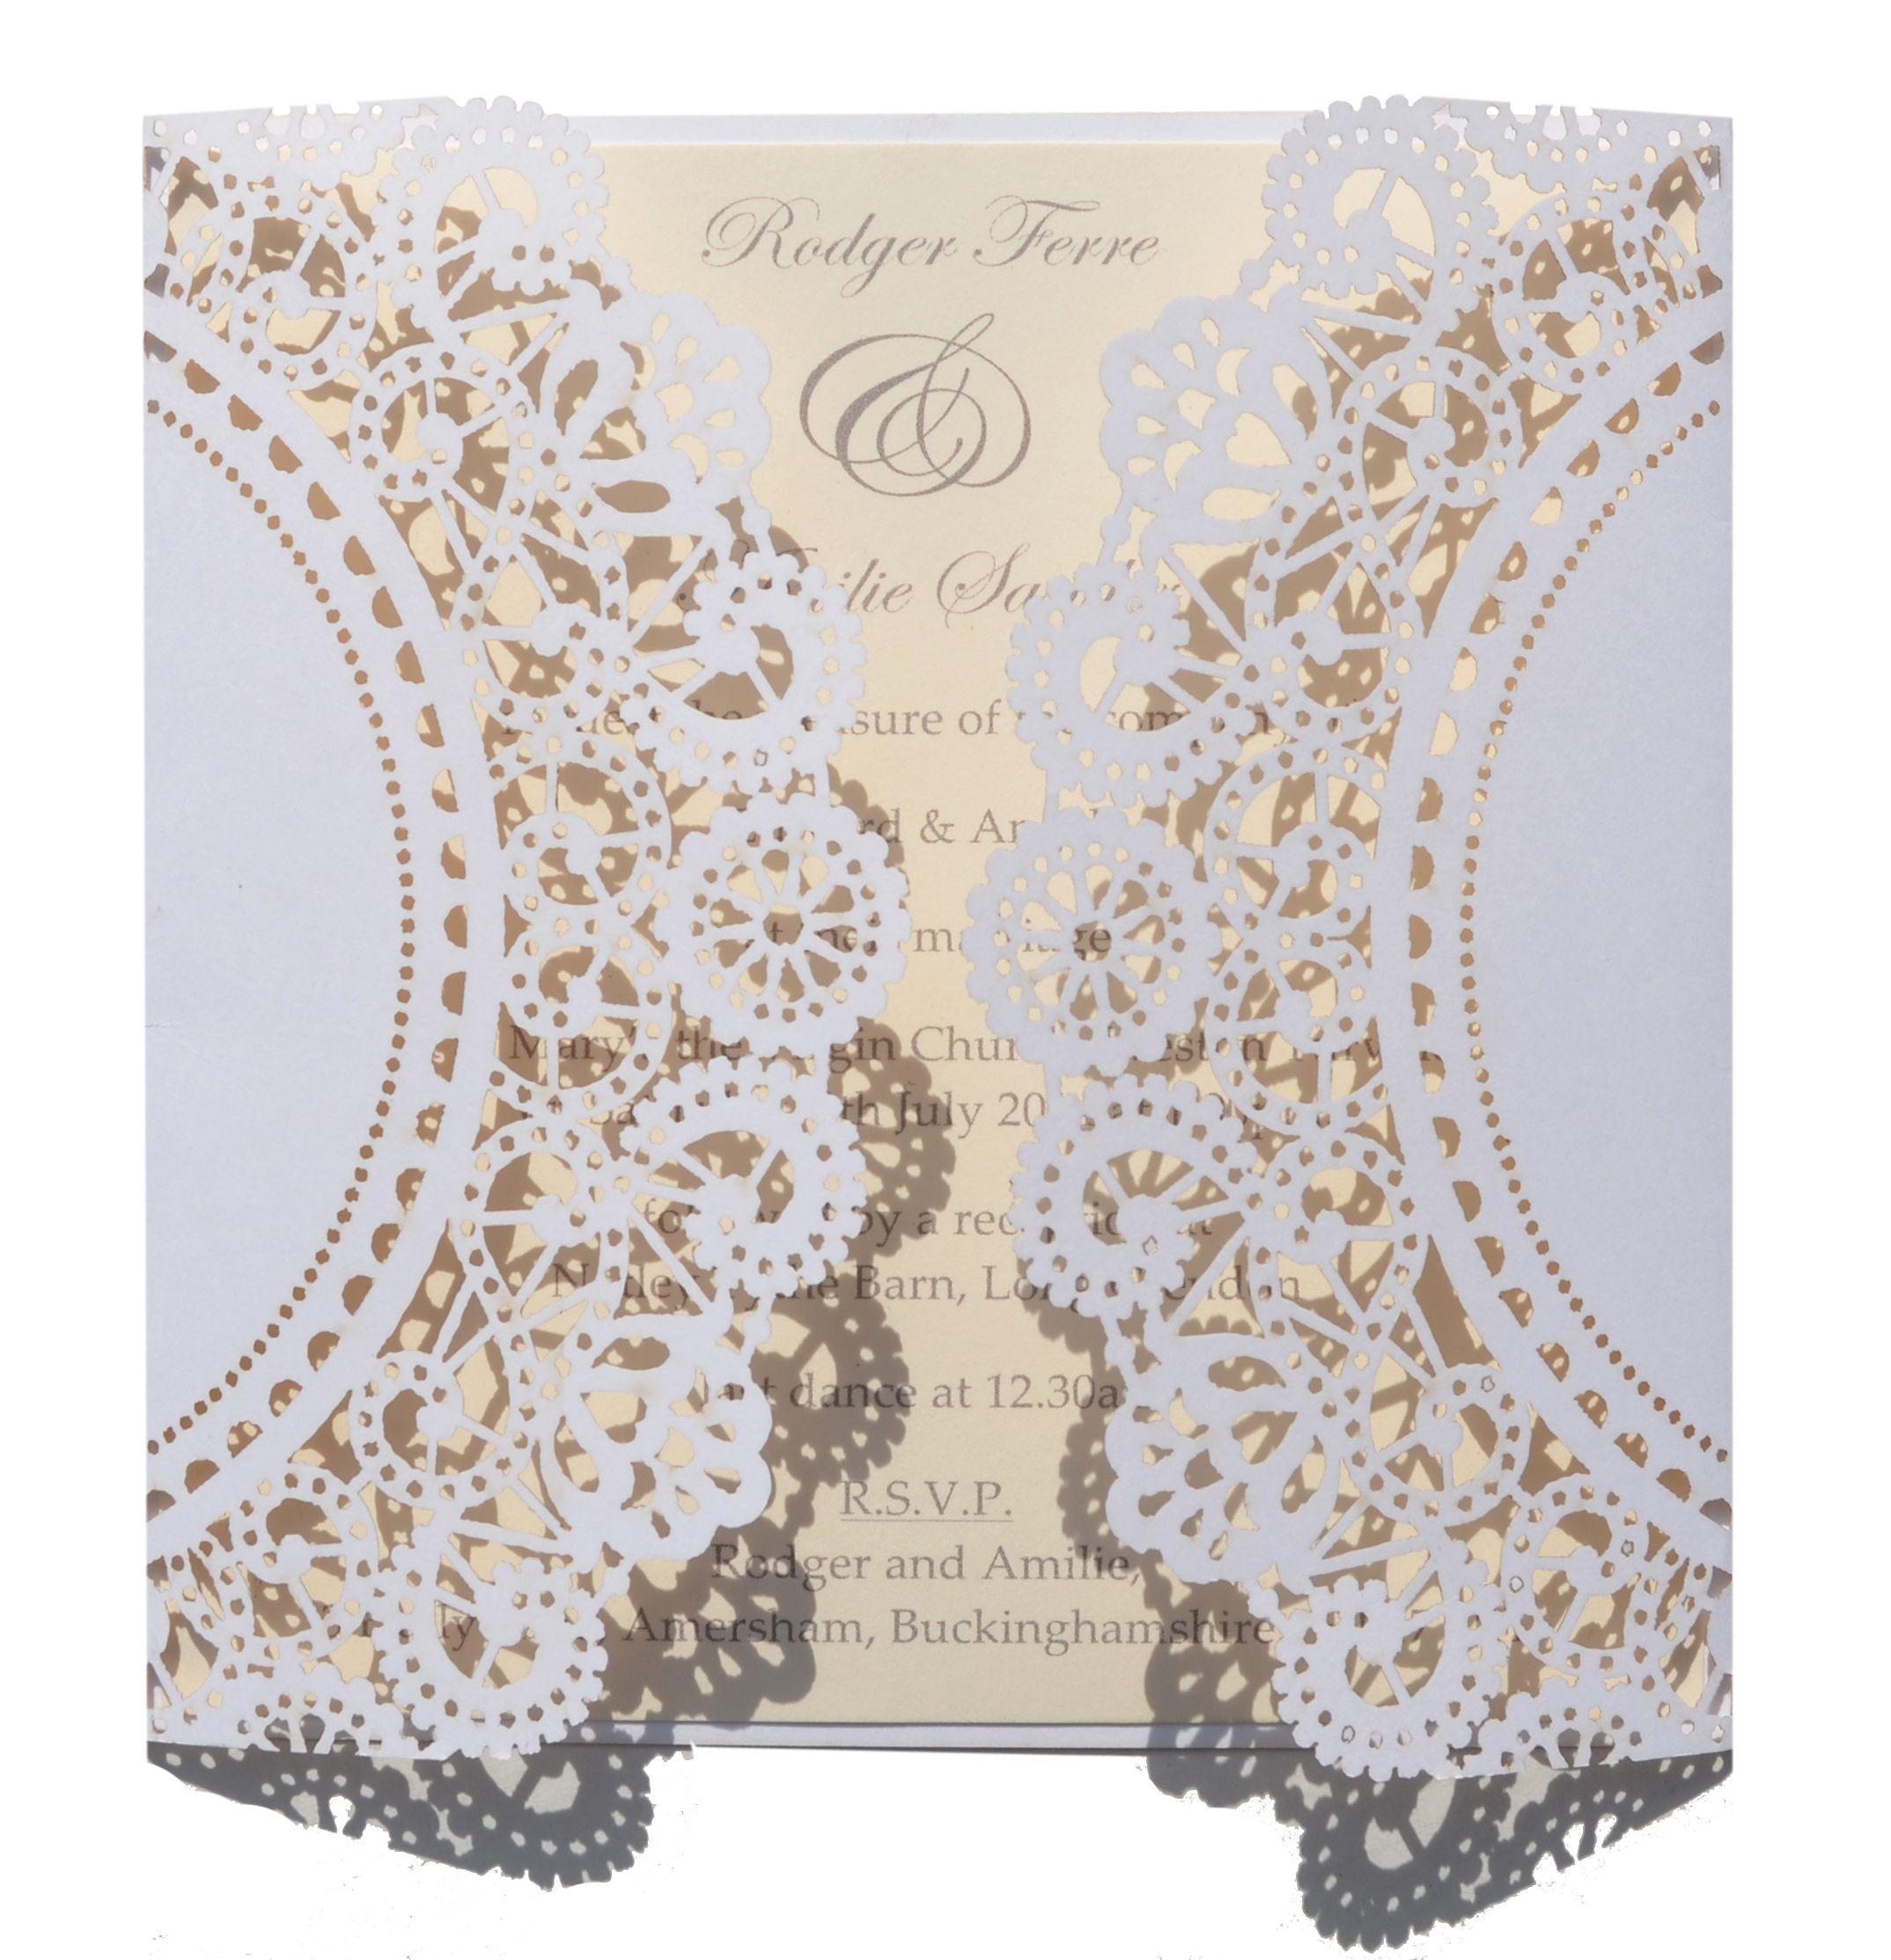 Doily lace laser cut invitation www.sew-unique.co.uk | Laser wedding ...